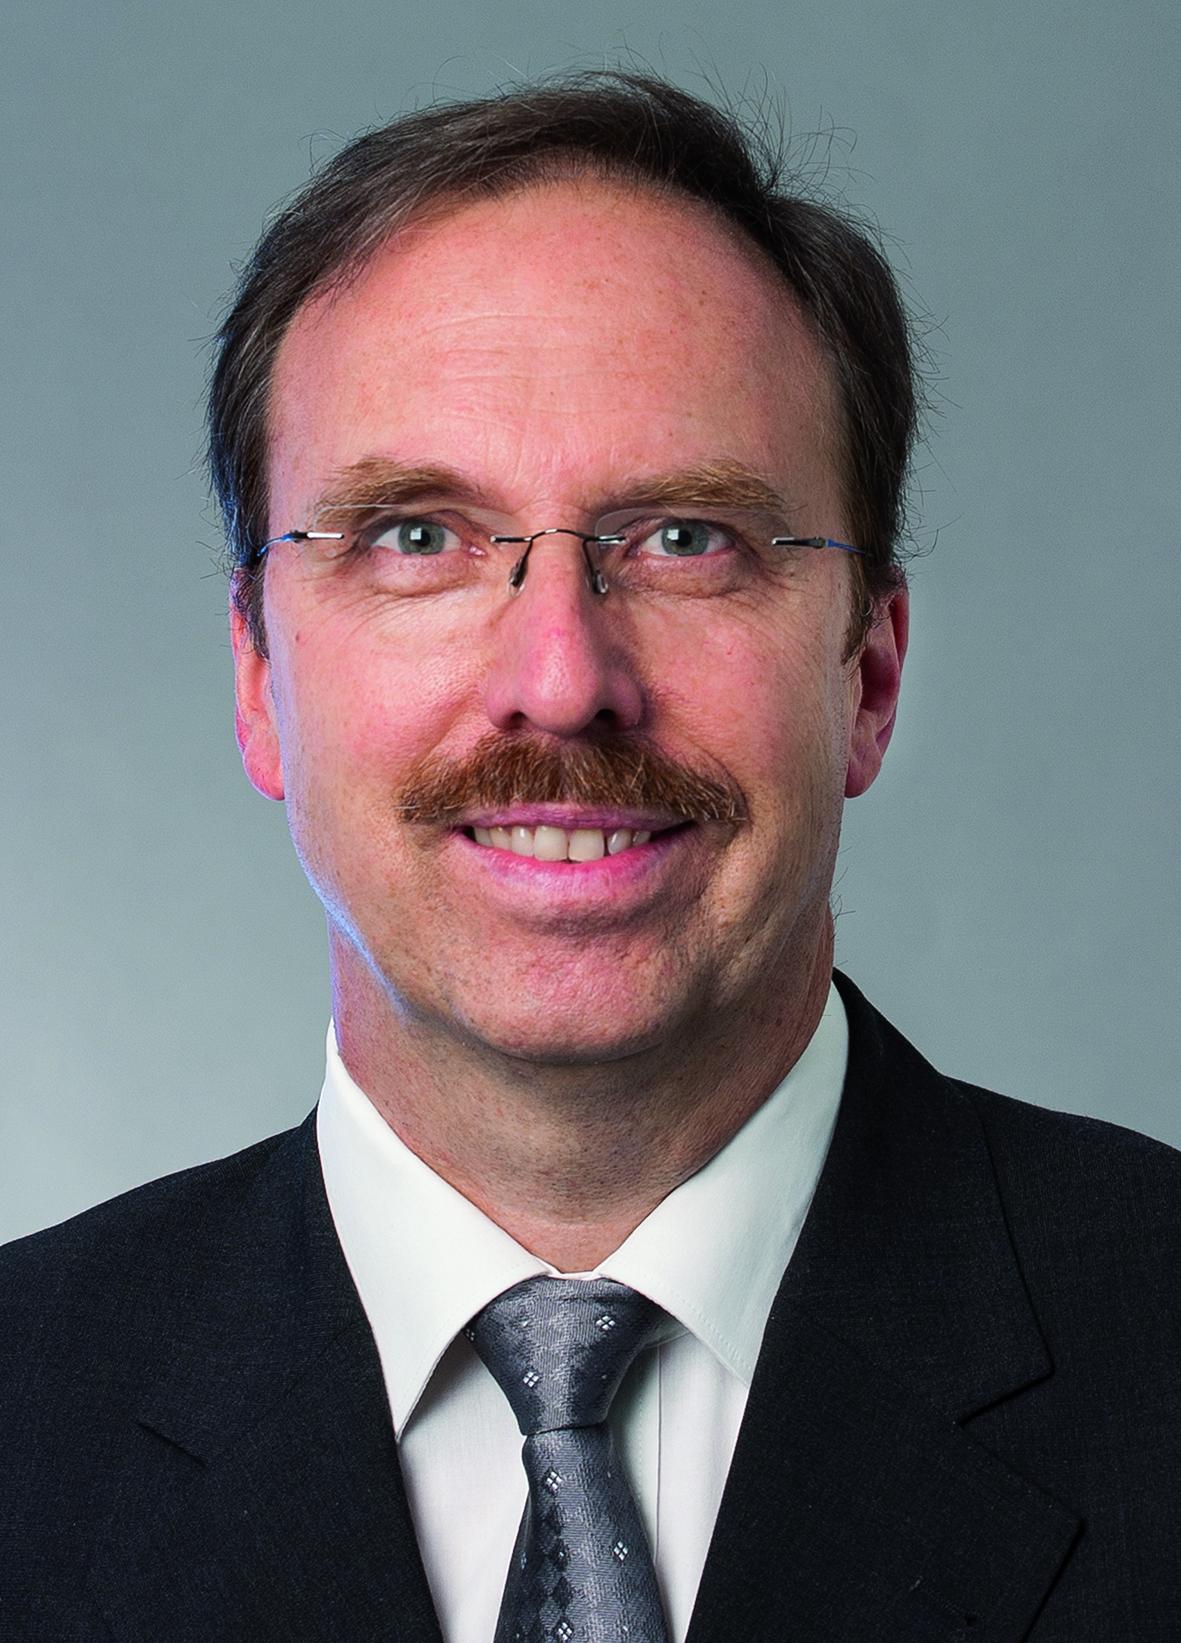 Jürgen Skowaisa, Produktmanagement Radar bei Vega